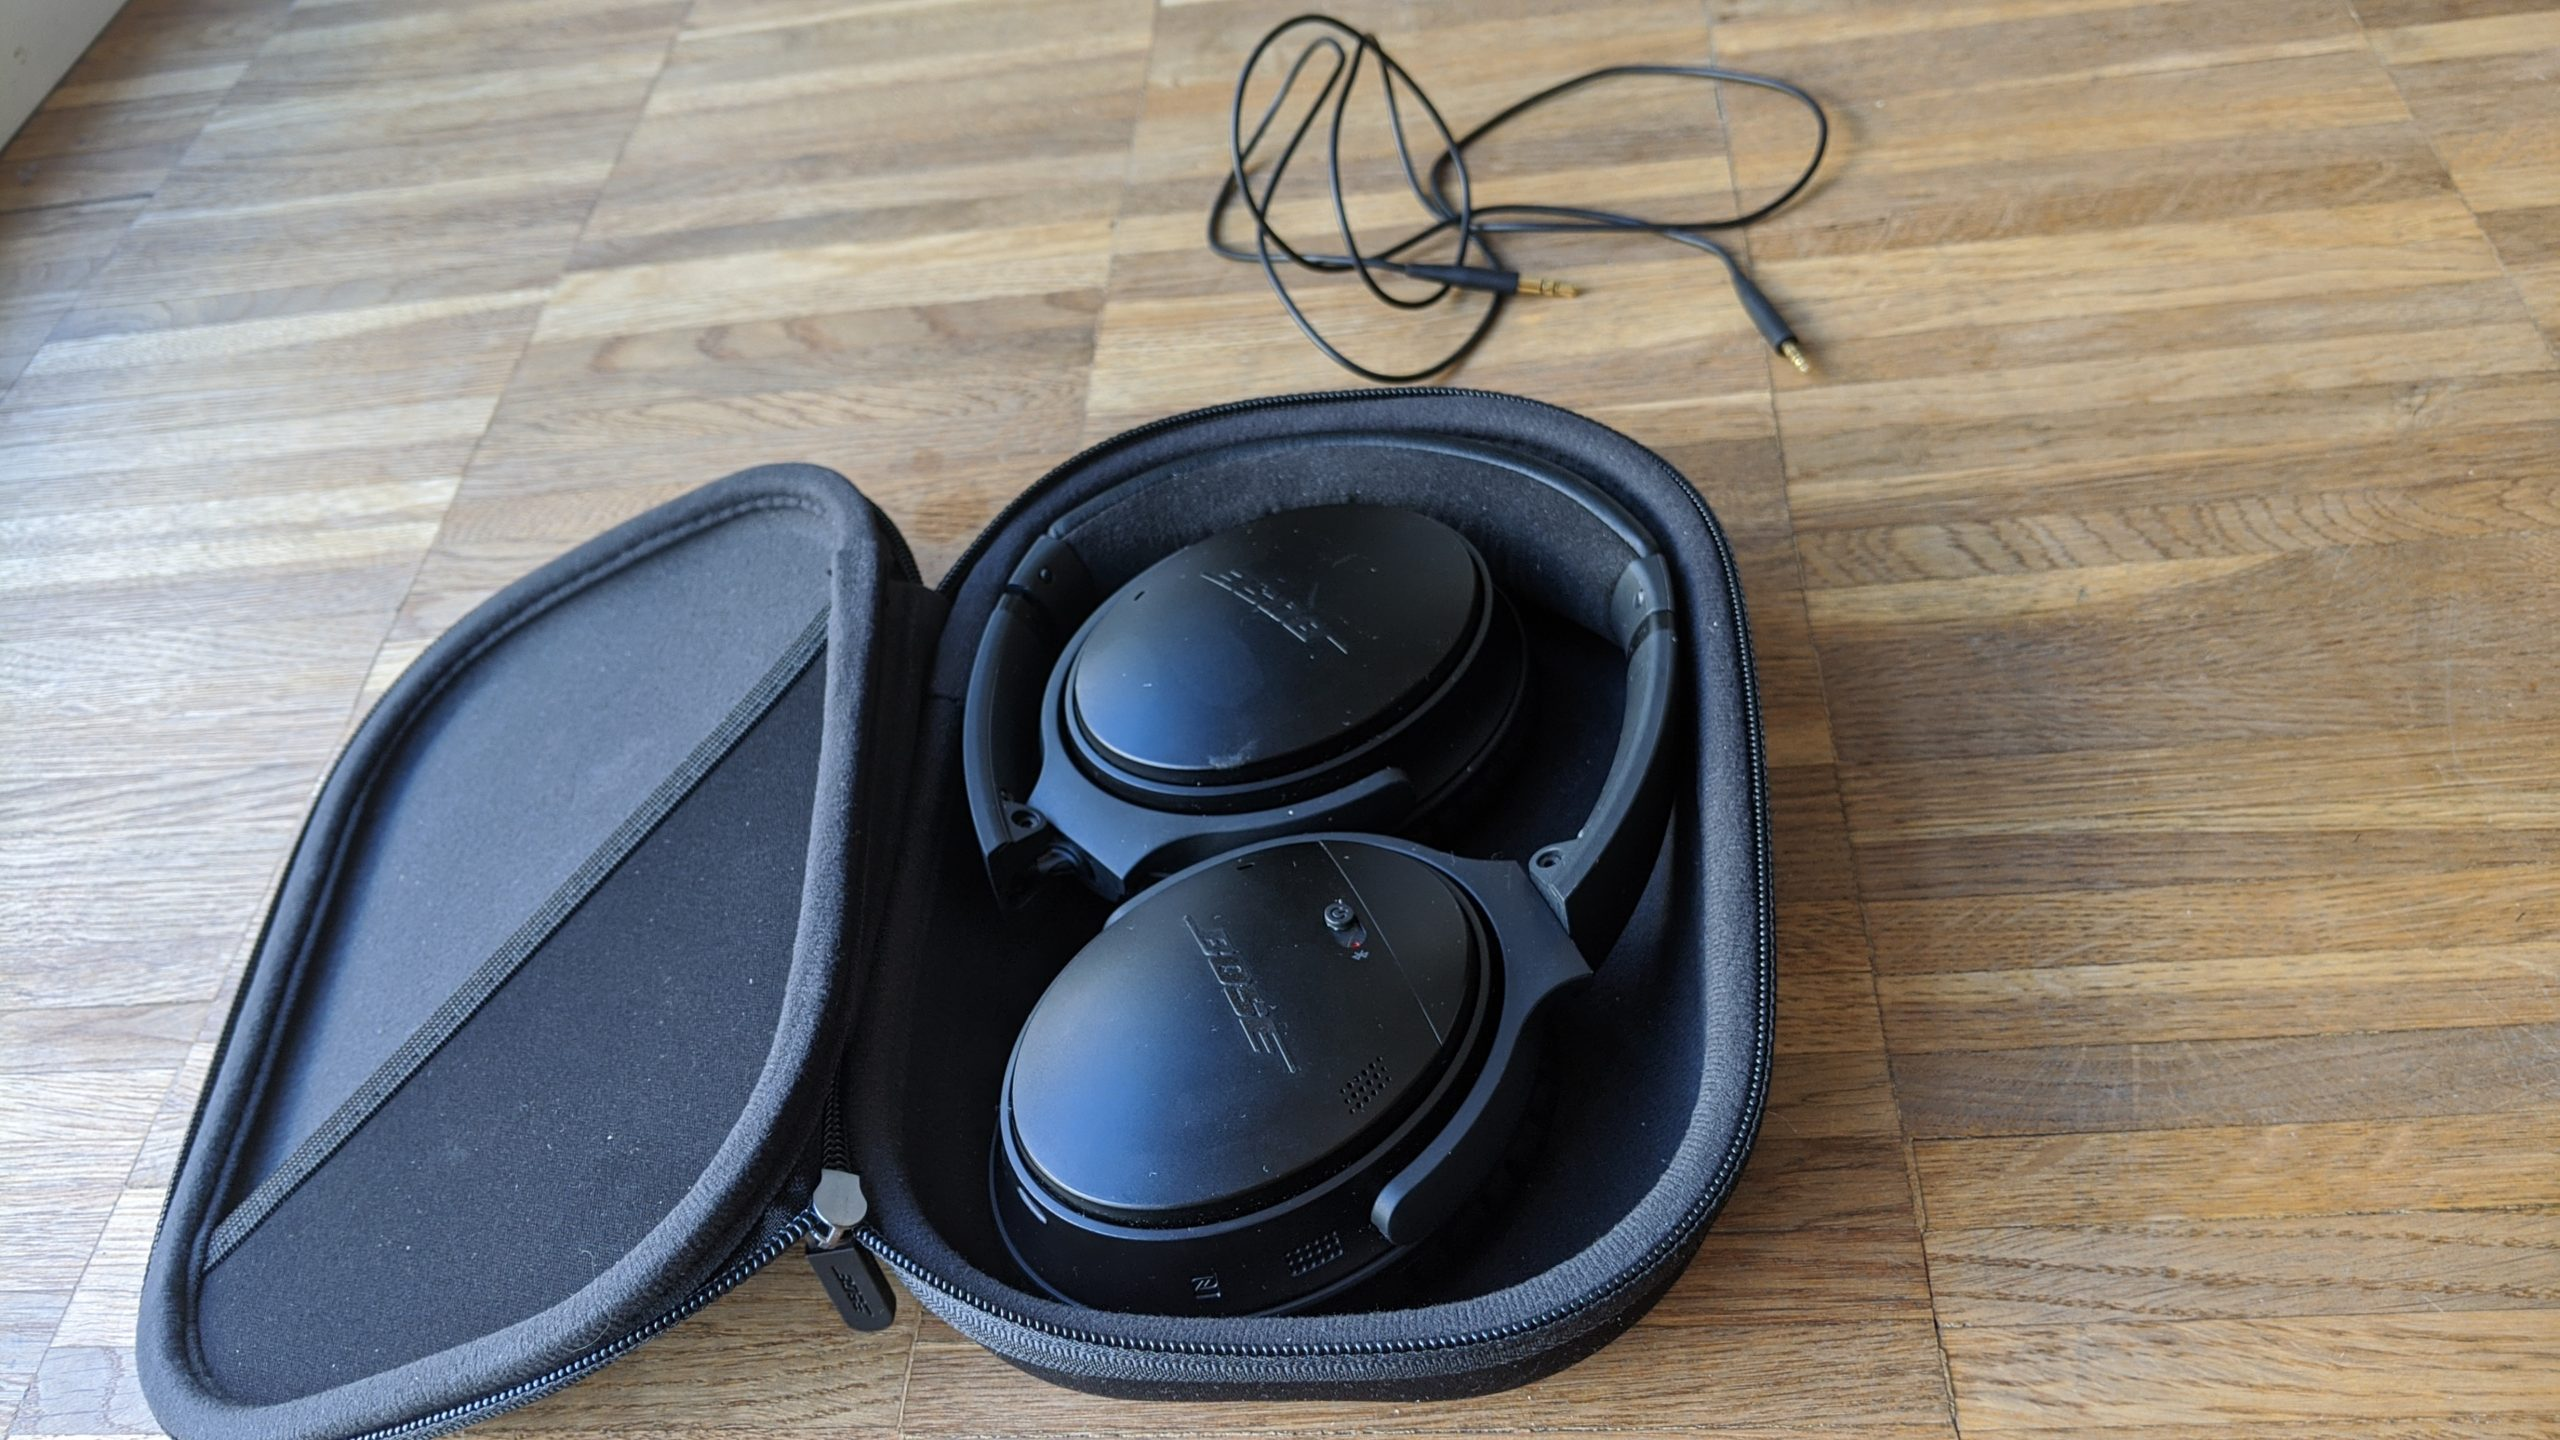 Bose QC35 II Noise-Cancelling Kopfhörer Reiseeutui